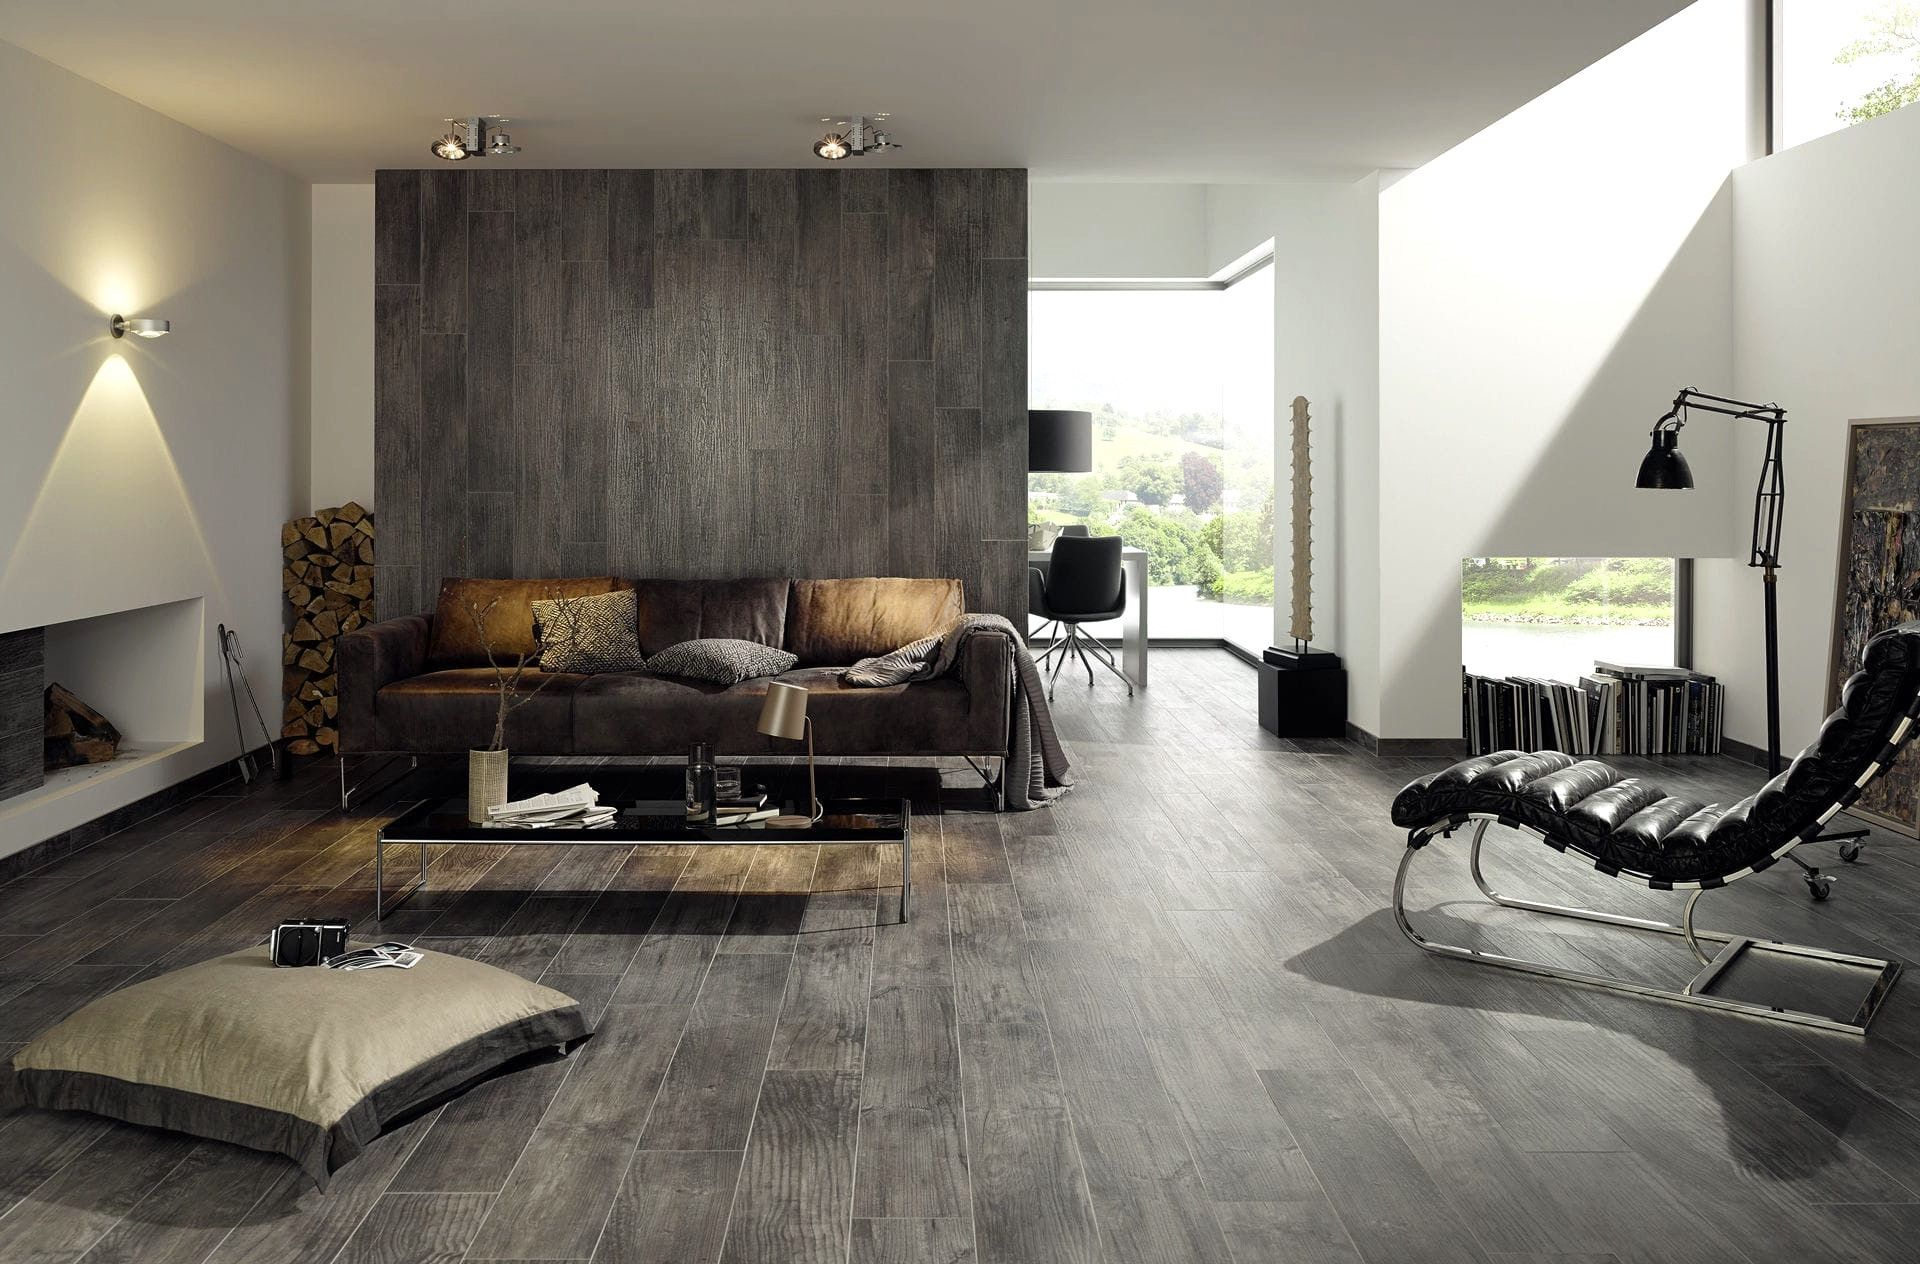 wohnzimmer fliesen ideen pk1. Black Bedroom Furniture Sets. Home Design Ideas